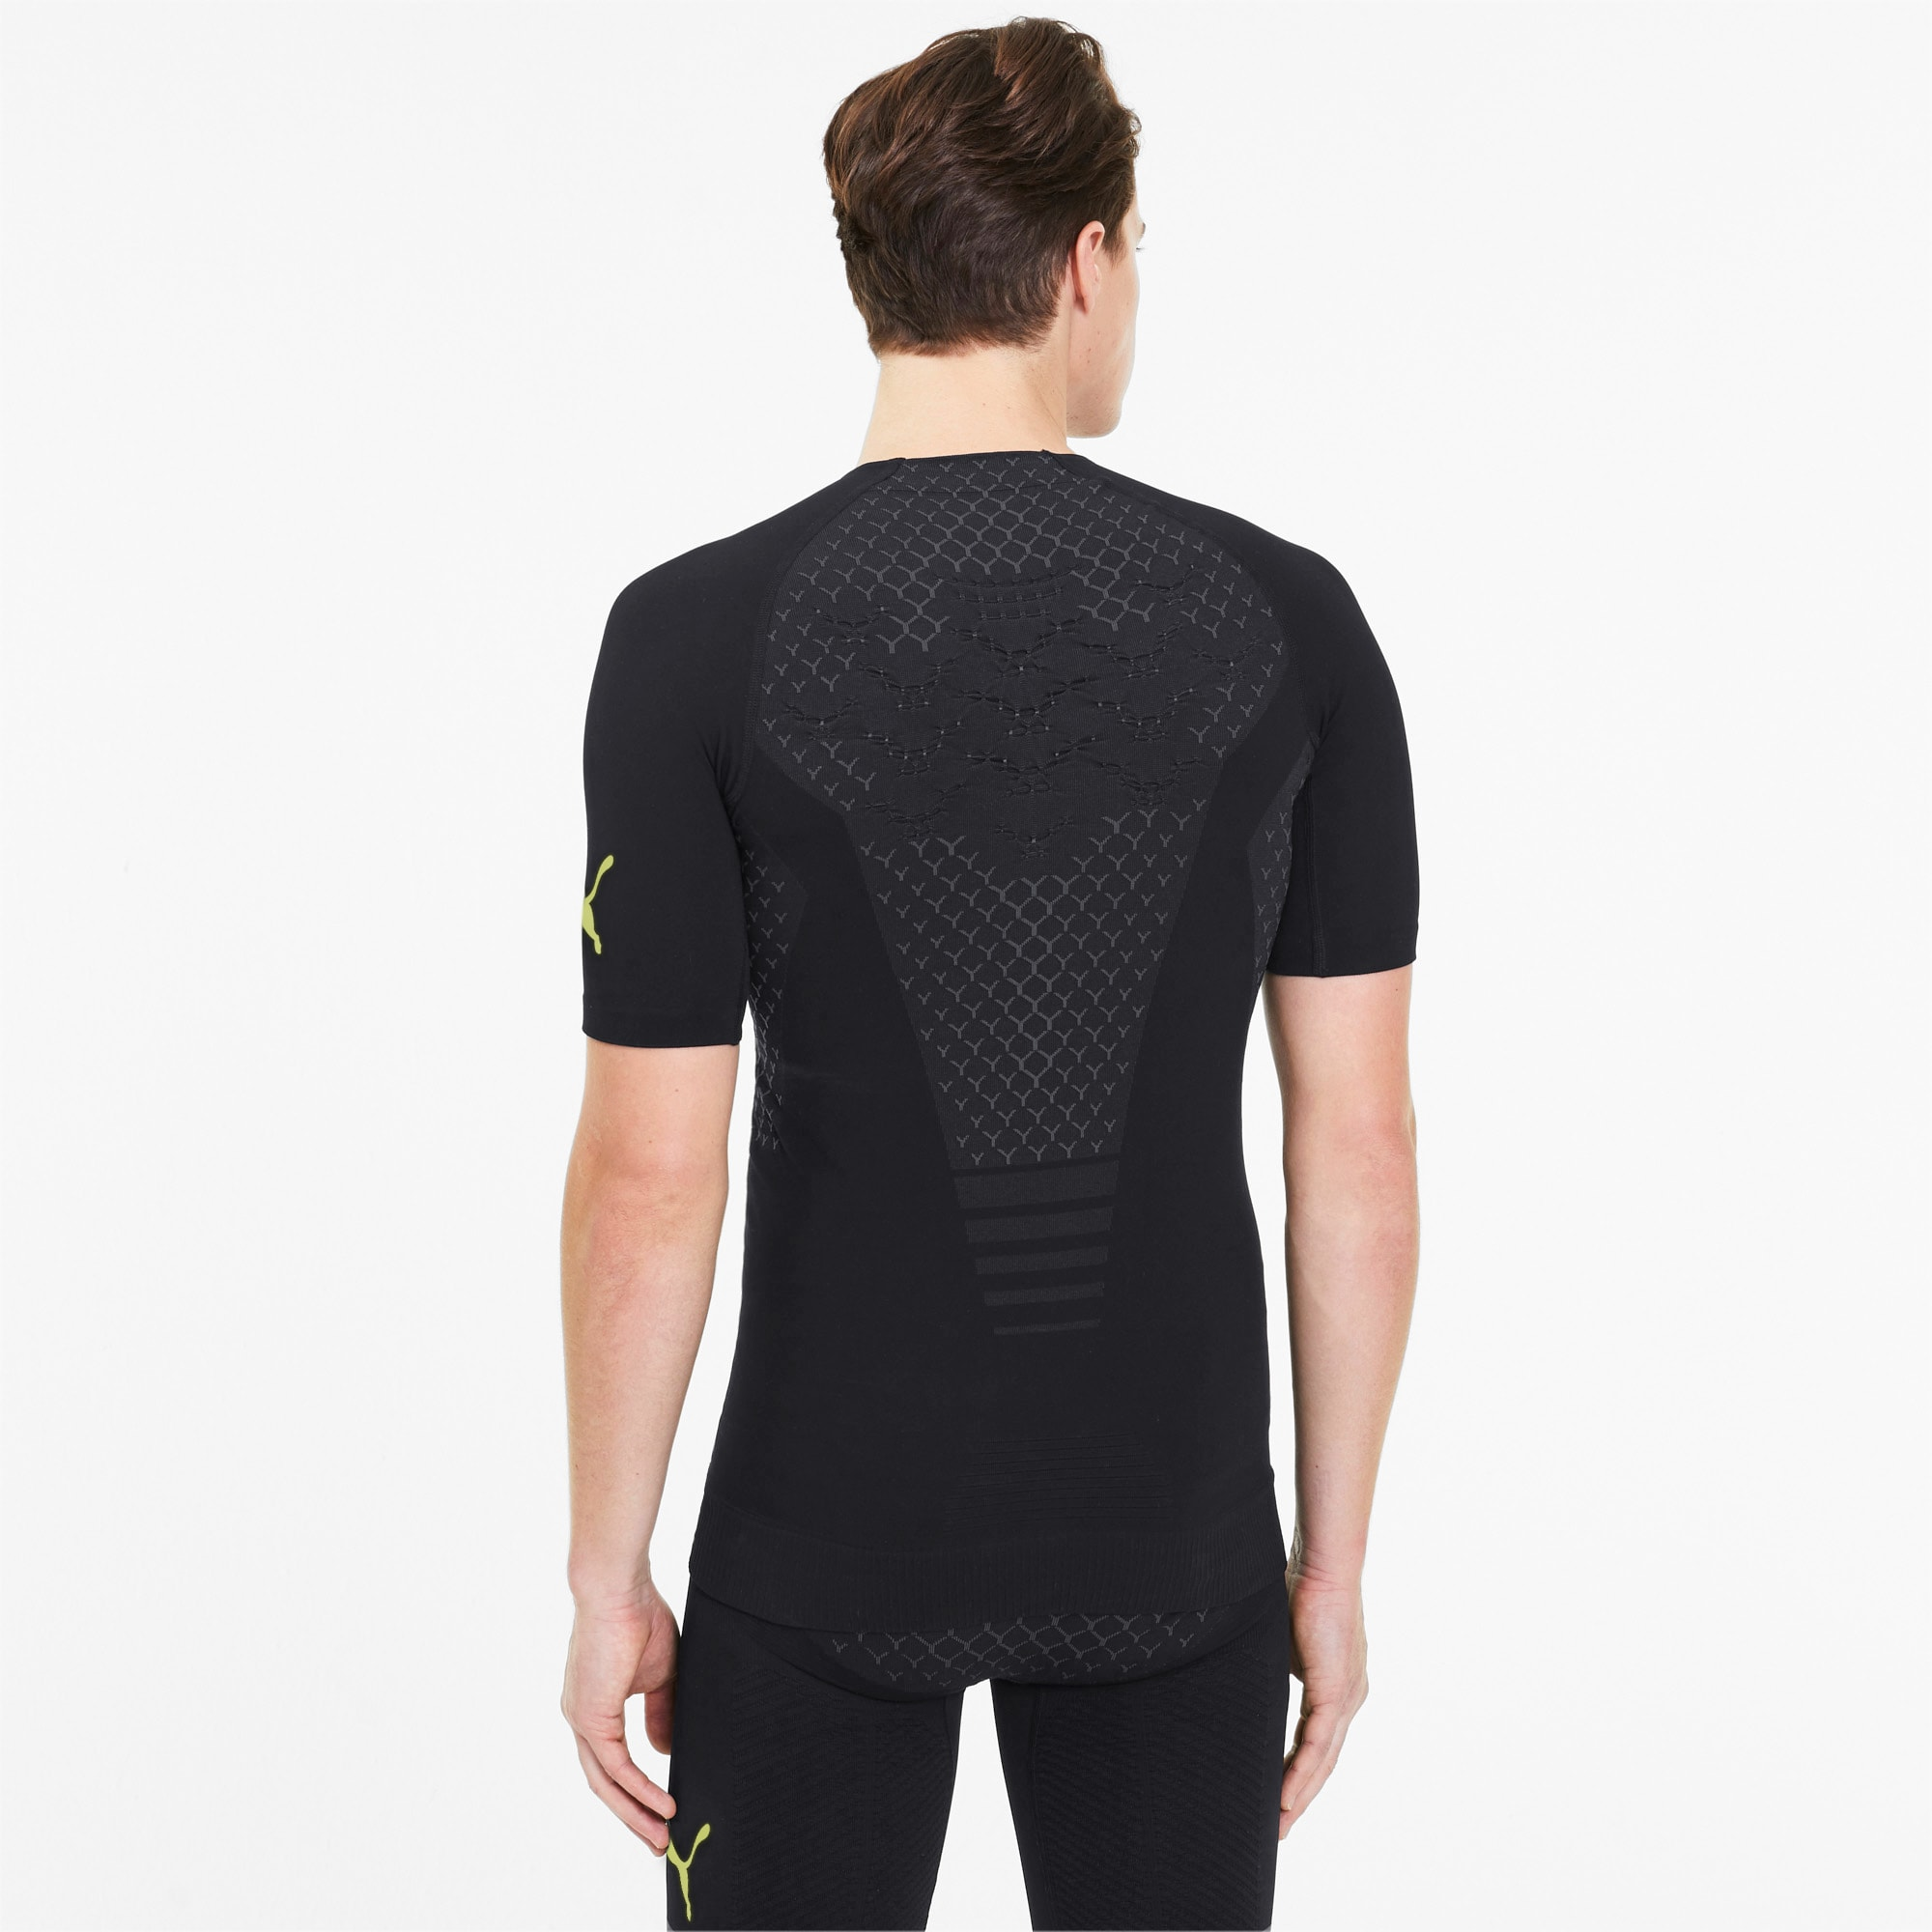 Camiseta de running para hombre X-Bionic